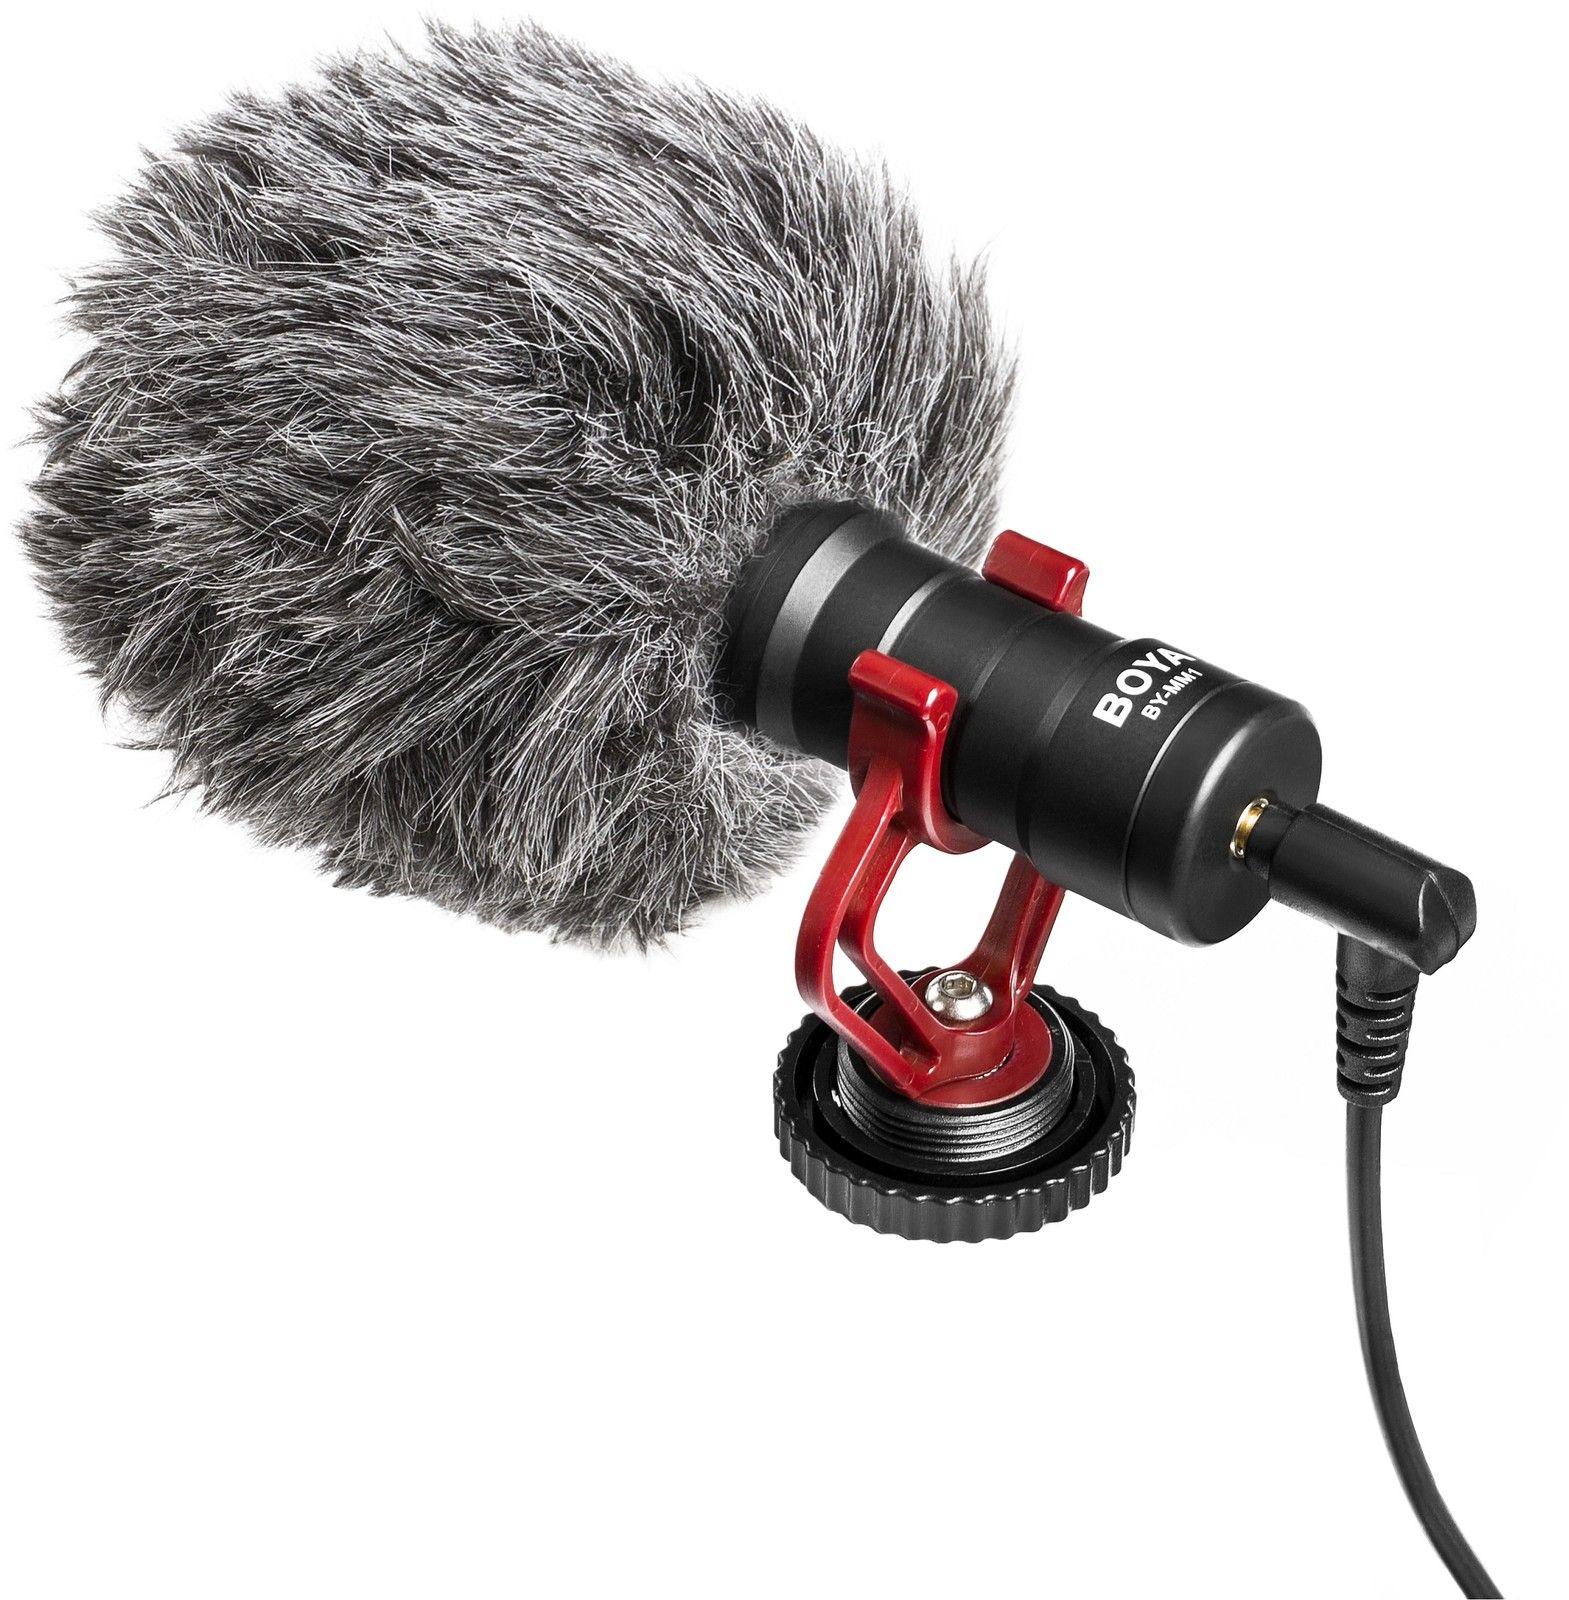 Boya BY-MM1 Cardioid Microphone 3,5 mm